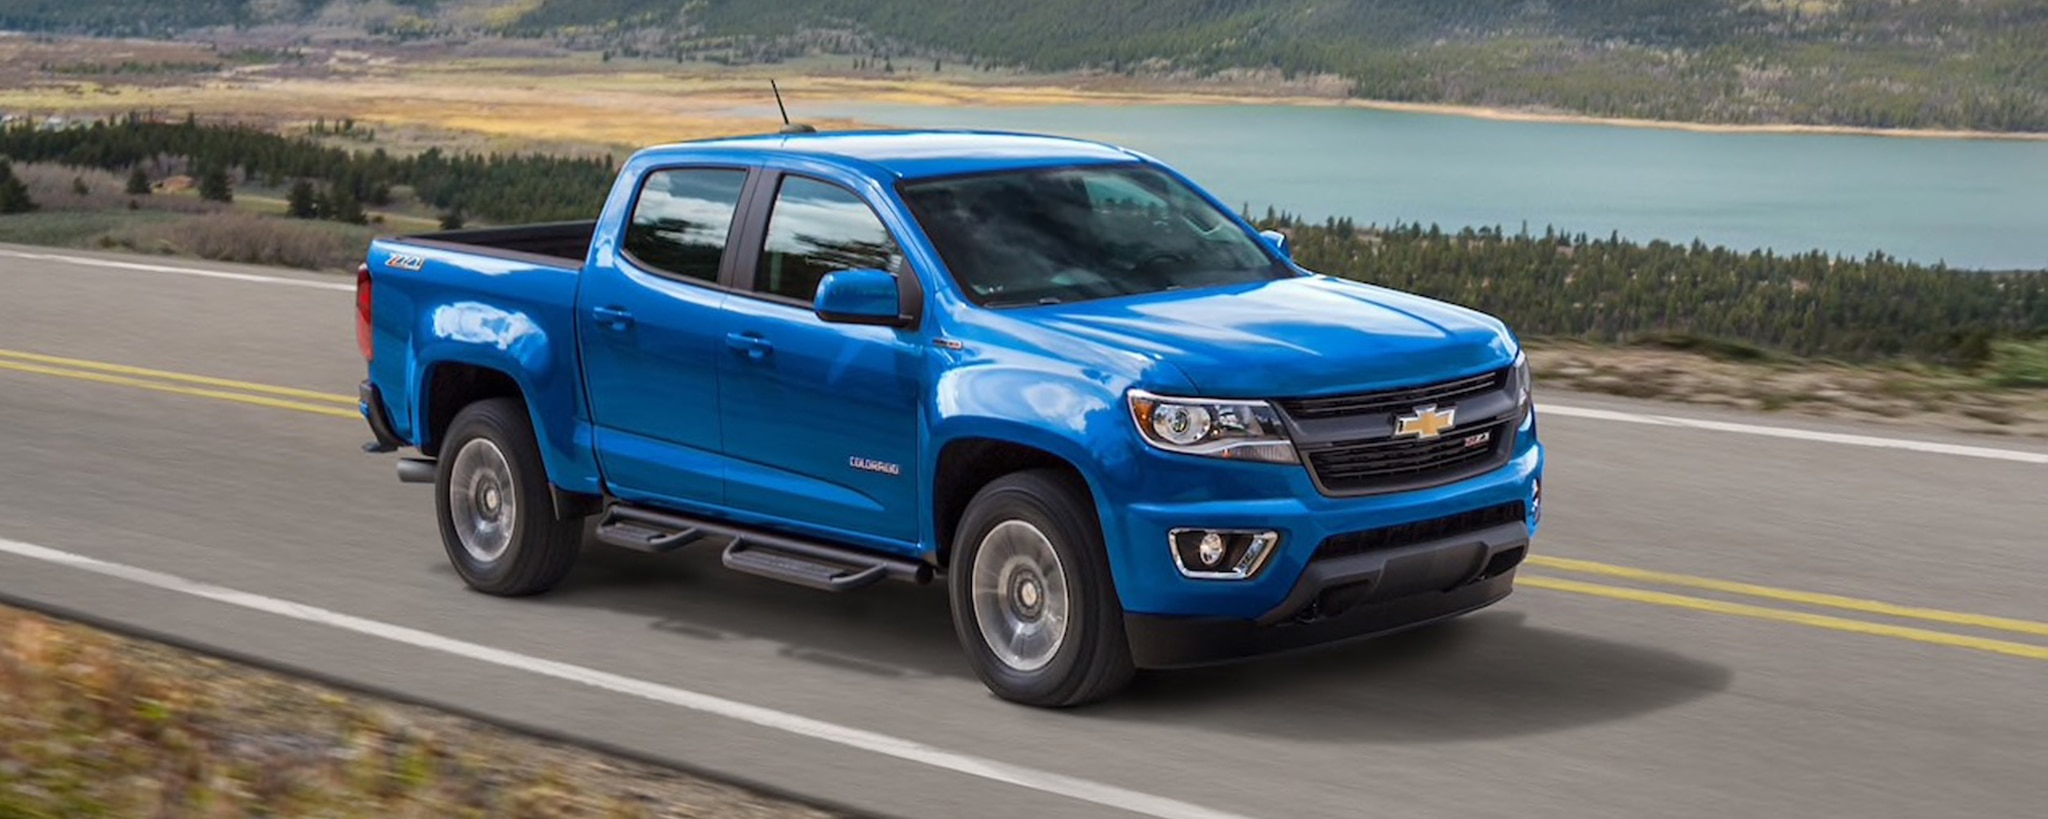 2020 Chevrolet Colorado Safety